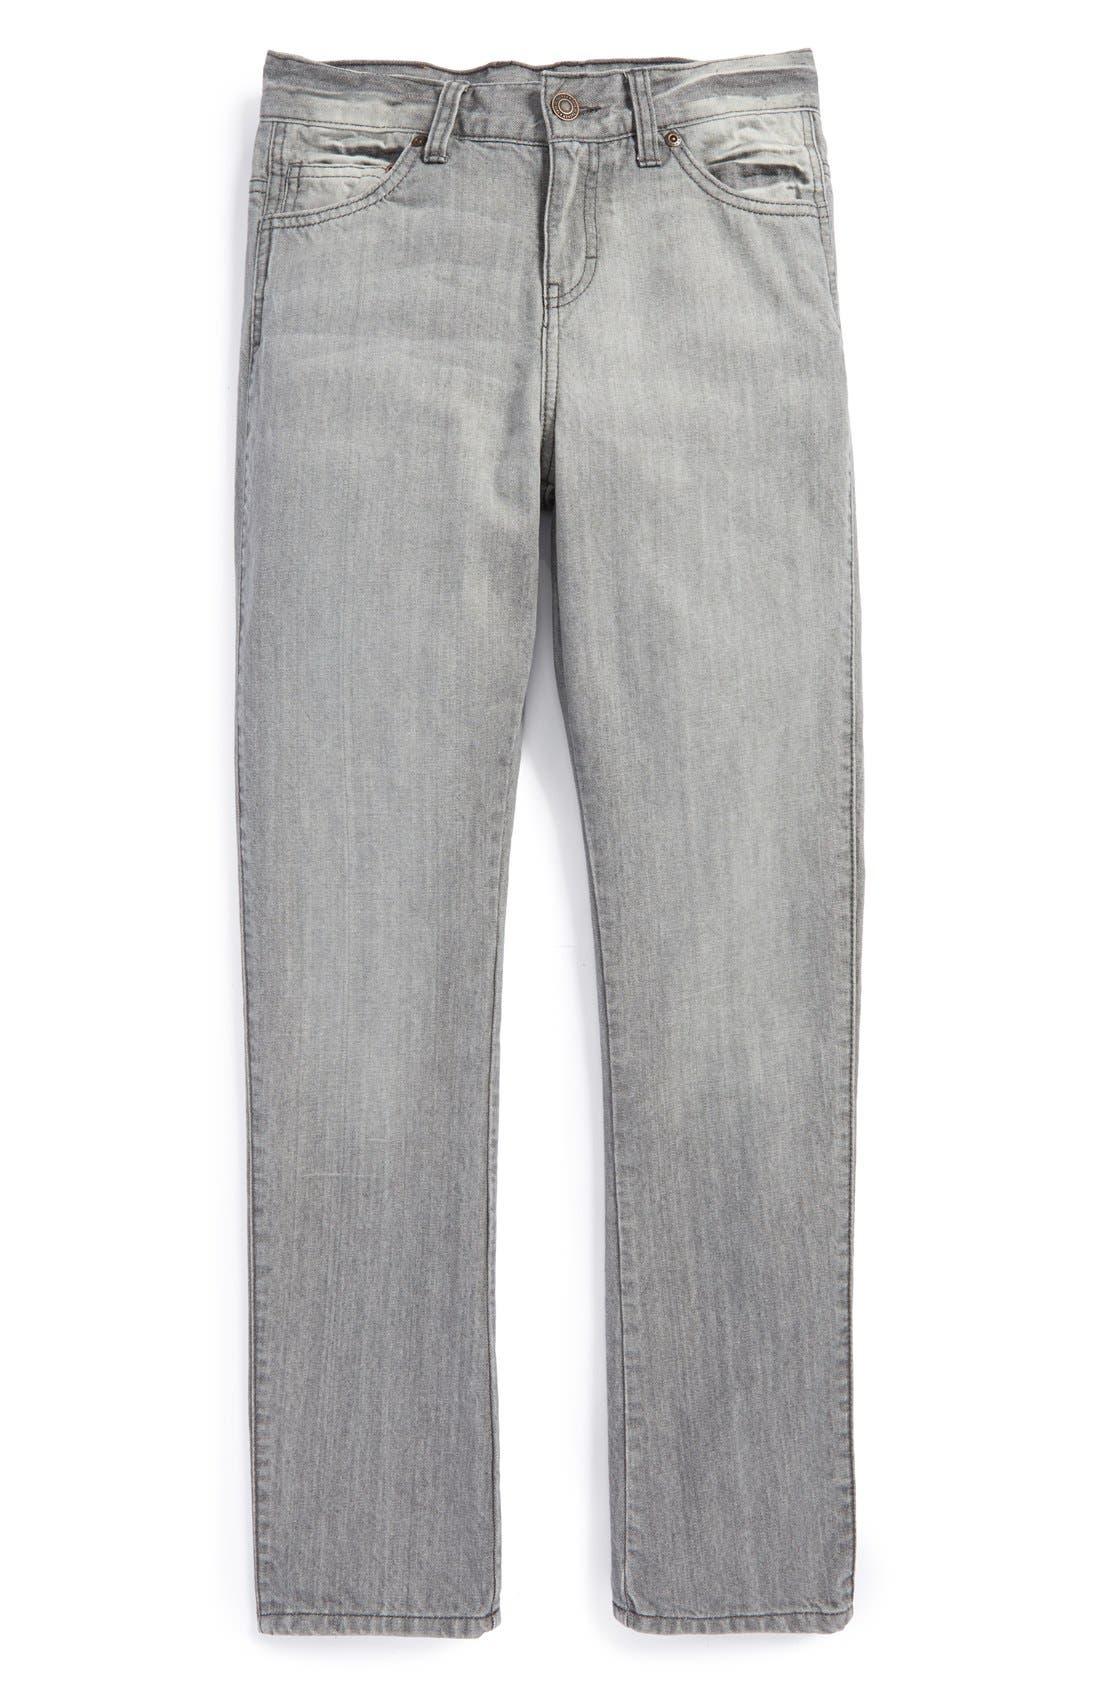 Alternate Image 2  - Tucker + Tate 'Rocco' Skinny Jeans (Big Boys)